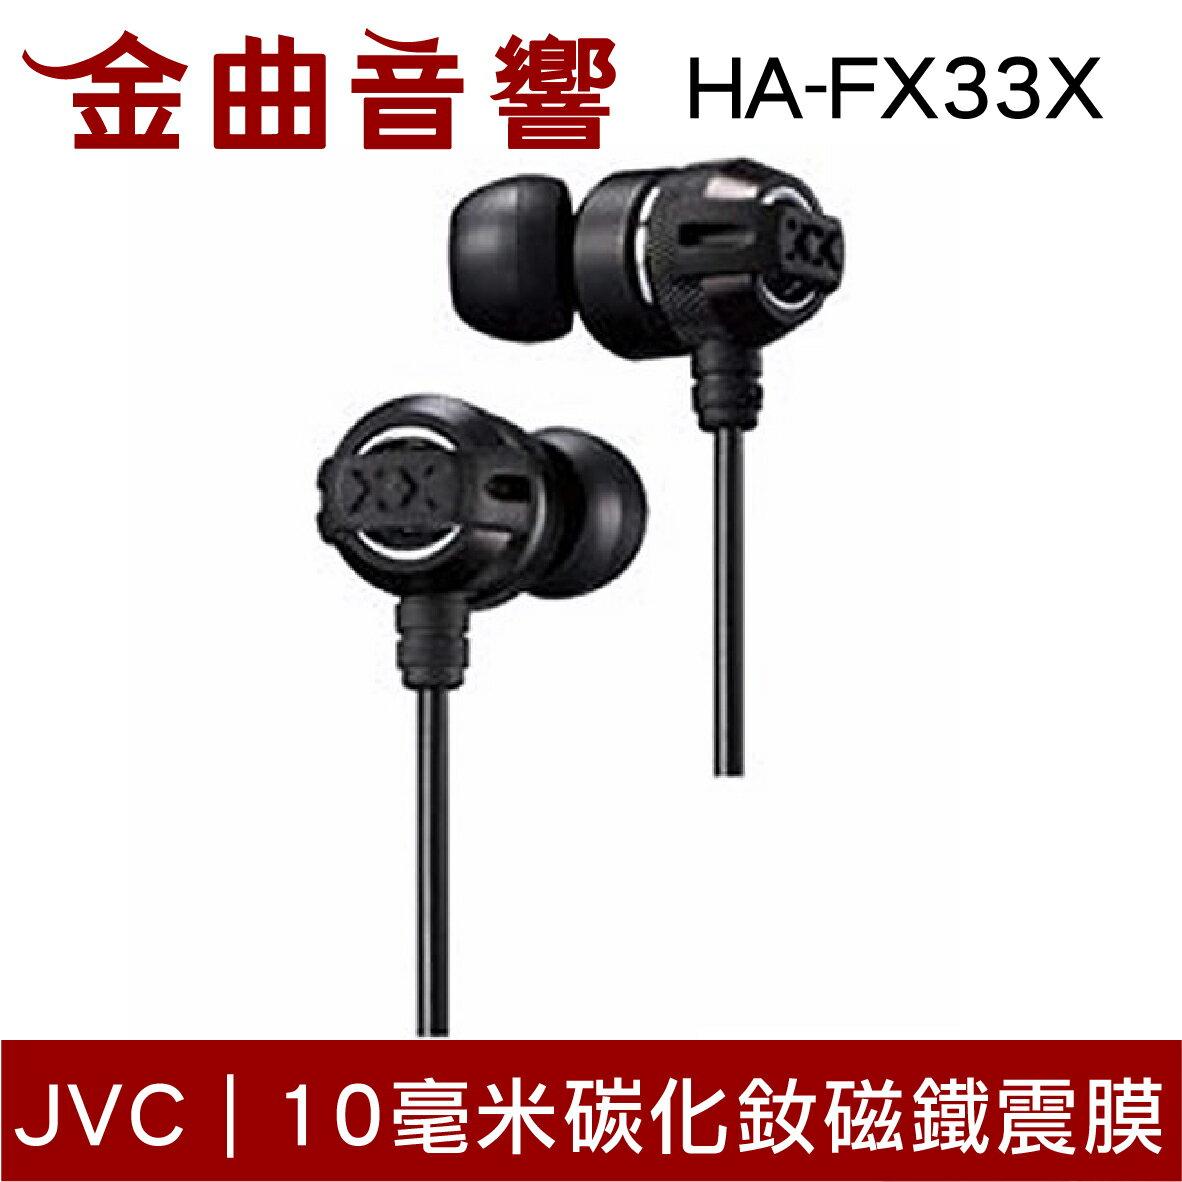 JVC 超重低音系列 HA-FX33X 黑 噪音隔離 耳道式耳機 | 金曲音響